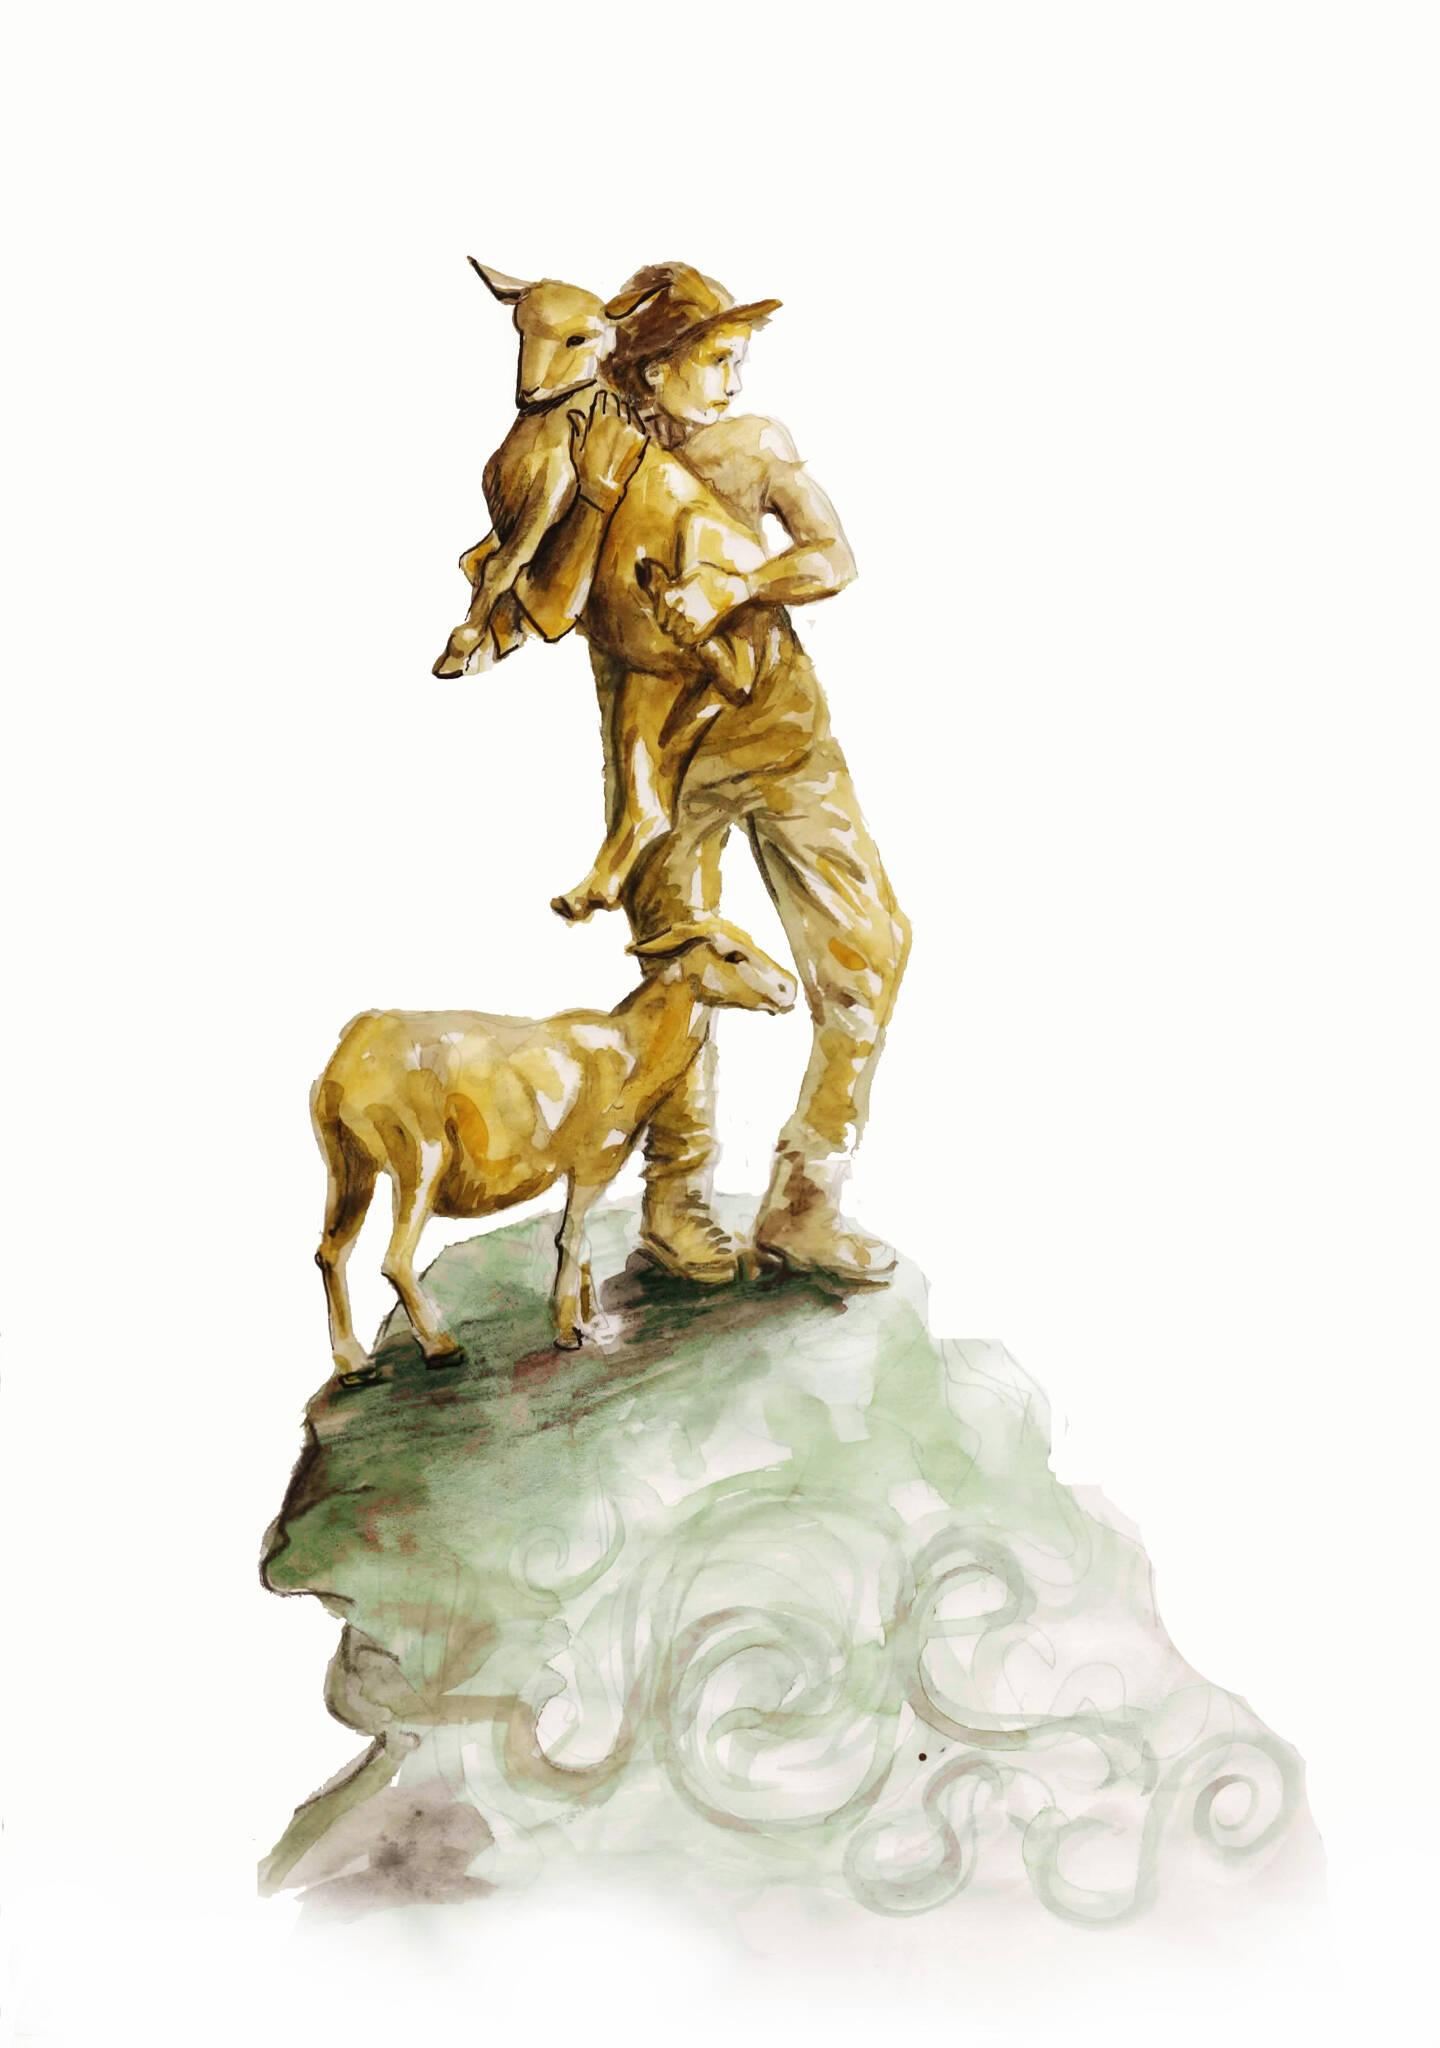 La sculpture représentera le berger disparu Joseph Giordano.